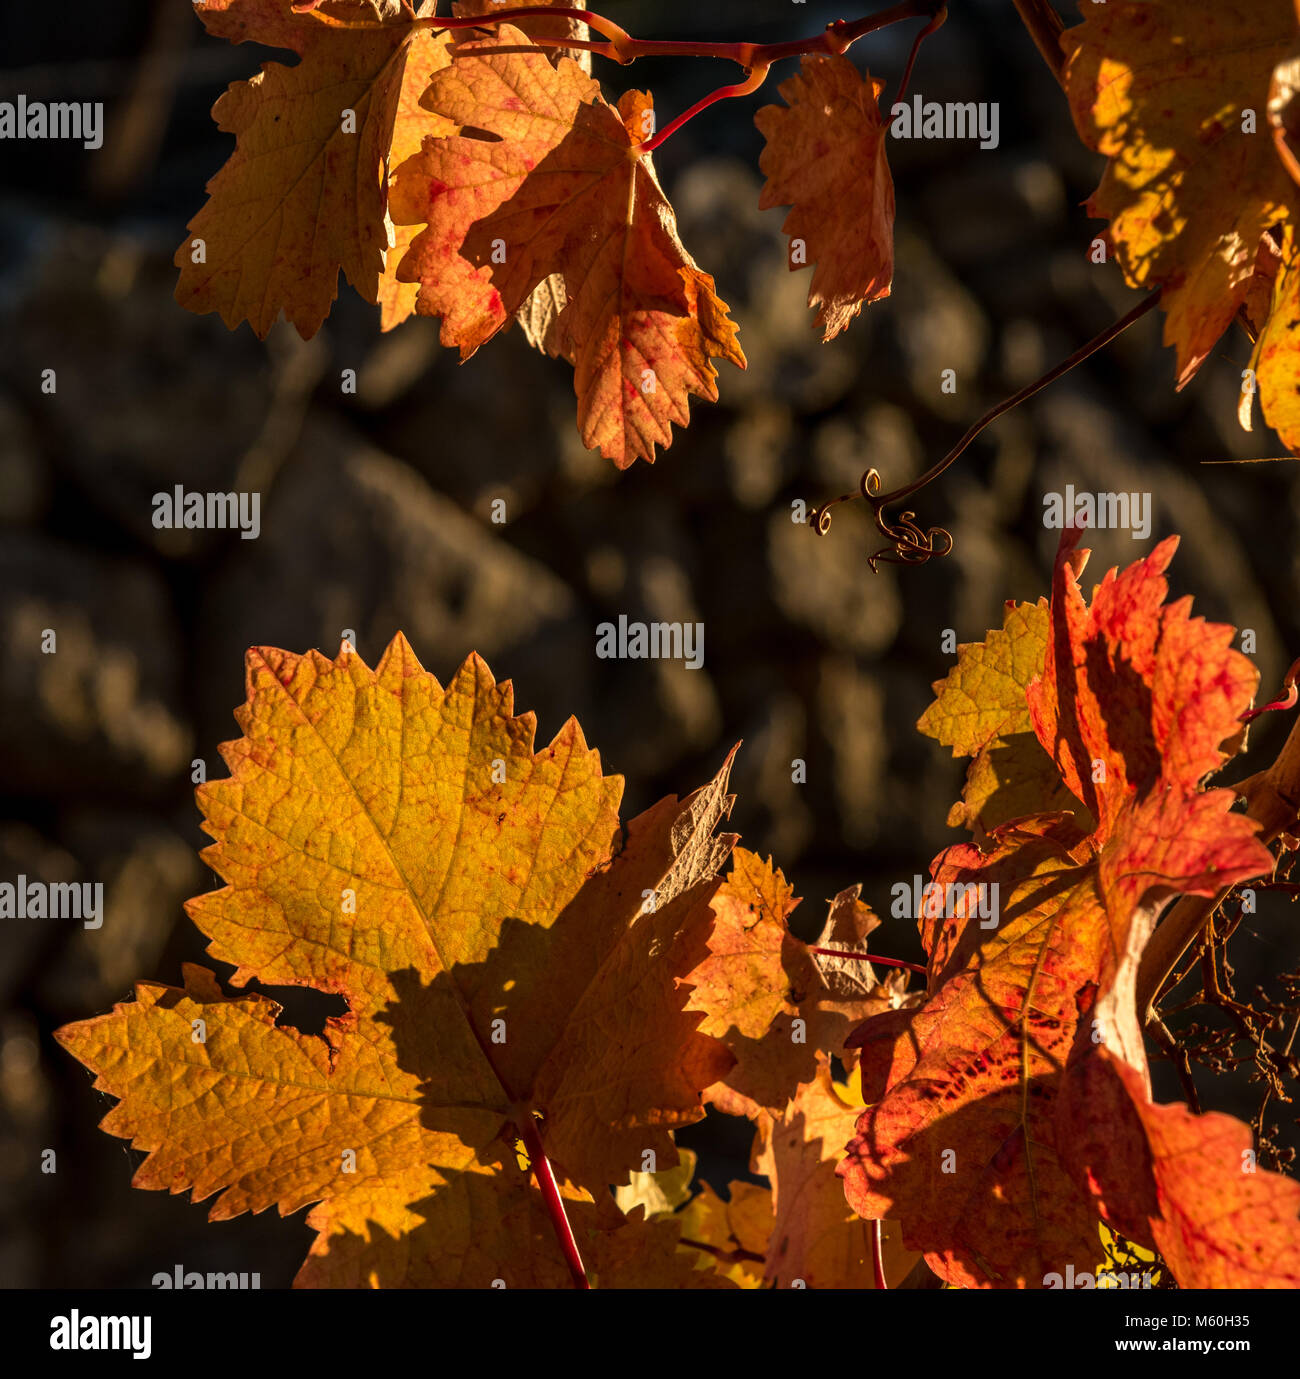 Colourful autumn leaves on grape vine near Beira, Alentejo, Portugal Stock Photo